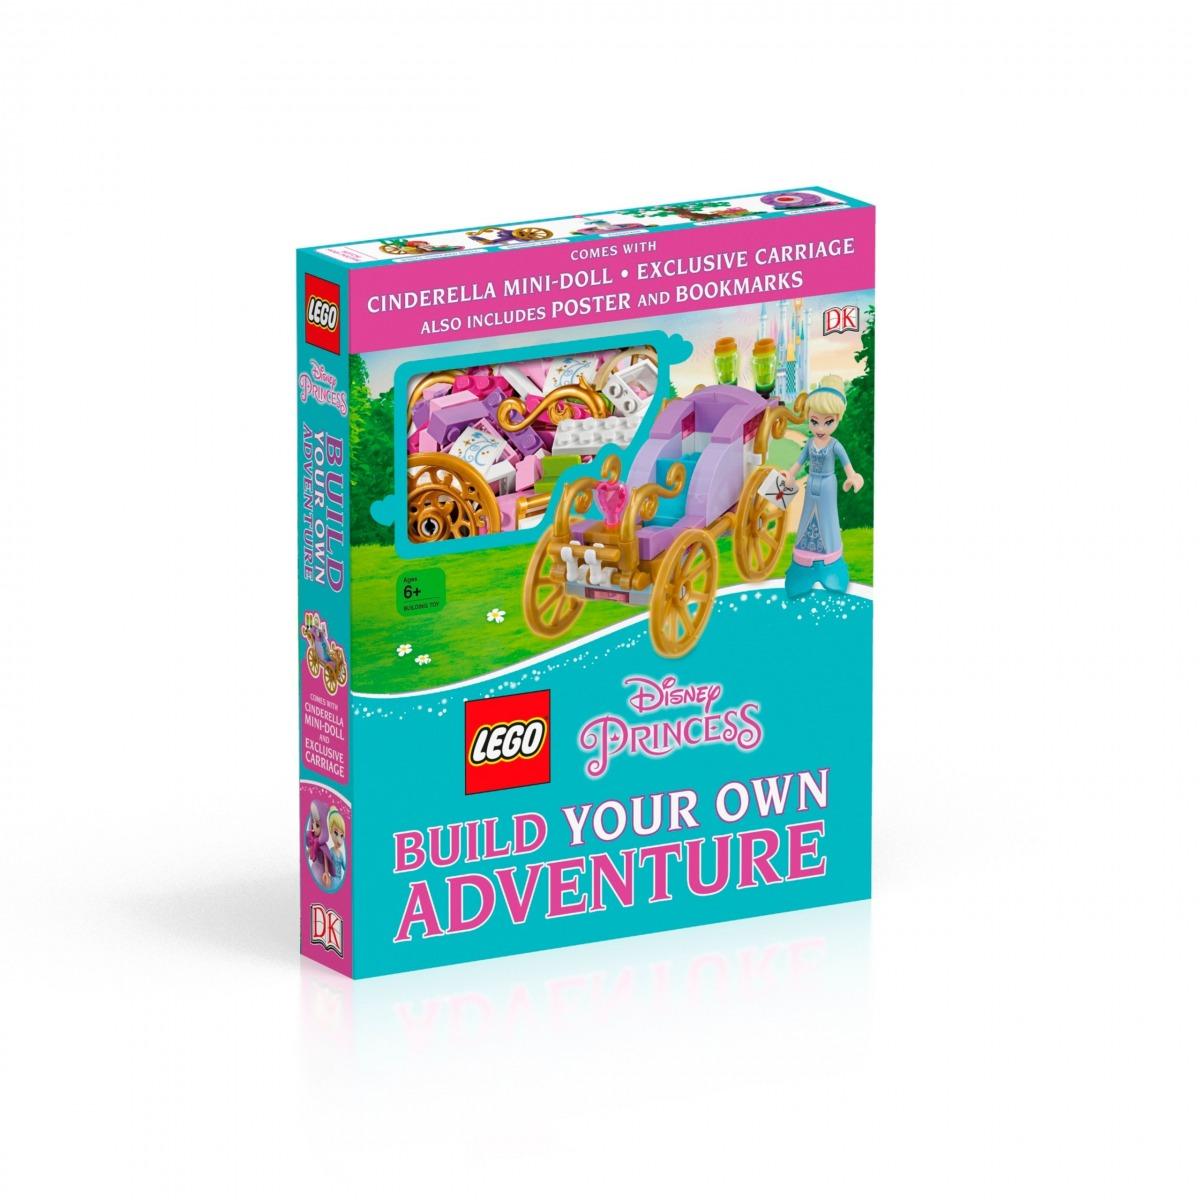 lego 5005655 l disney princess build your own adventure scaled